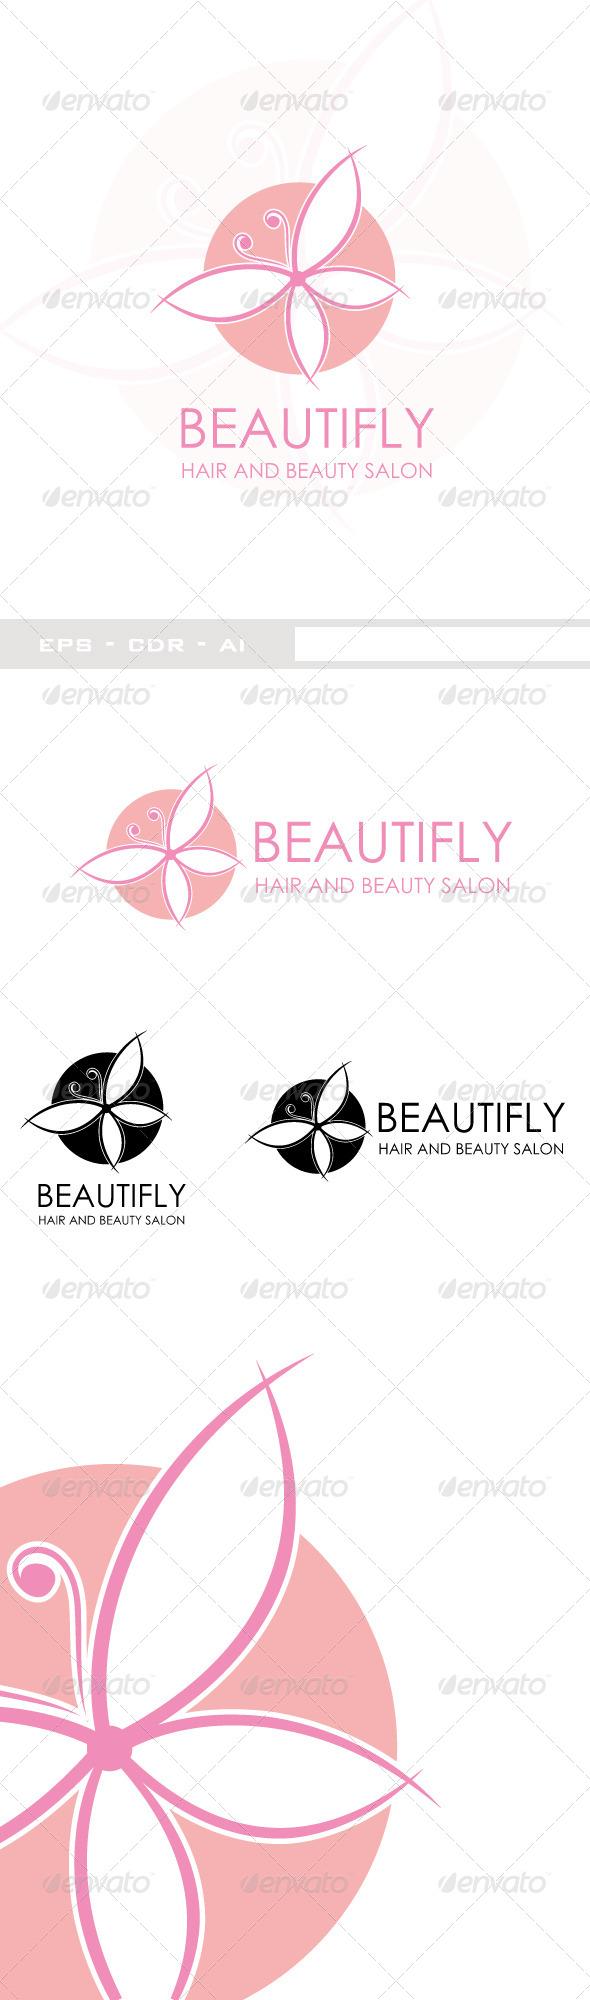 GraphicRiver Beautifly Beauty Logo 6344193